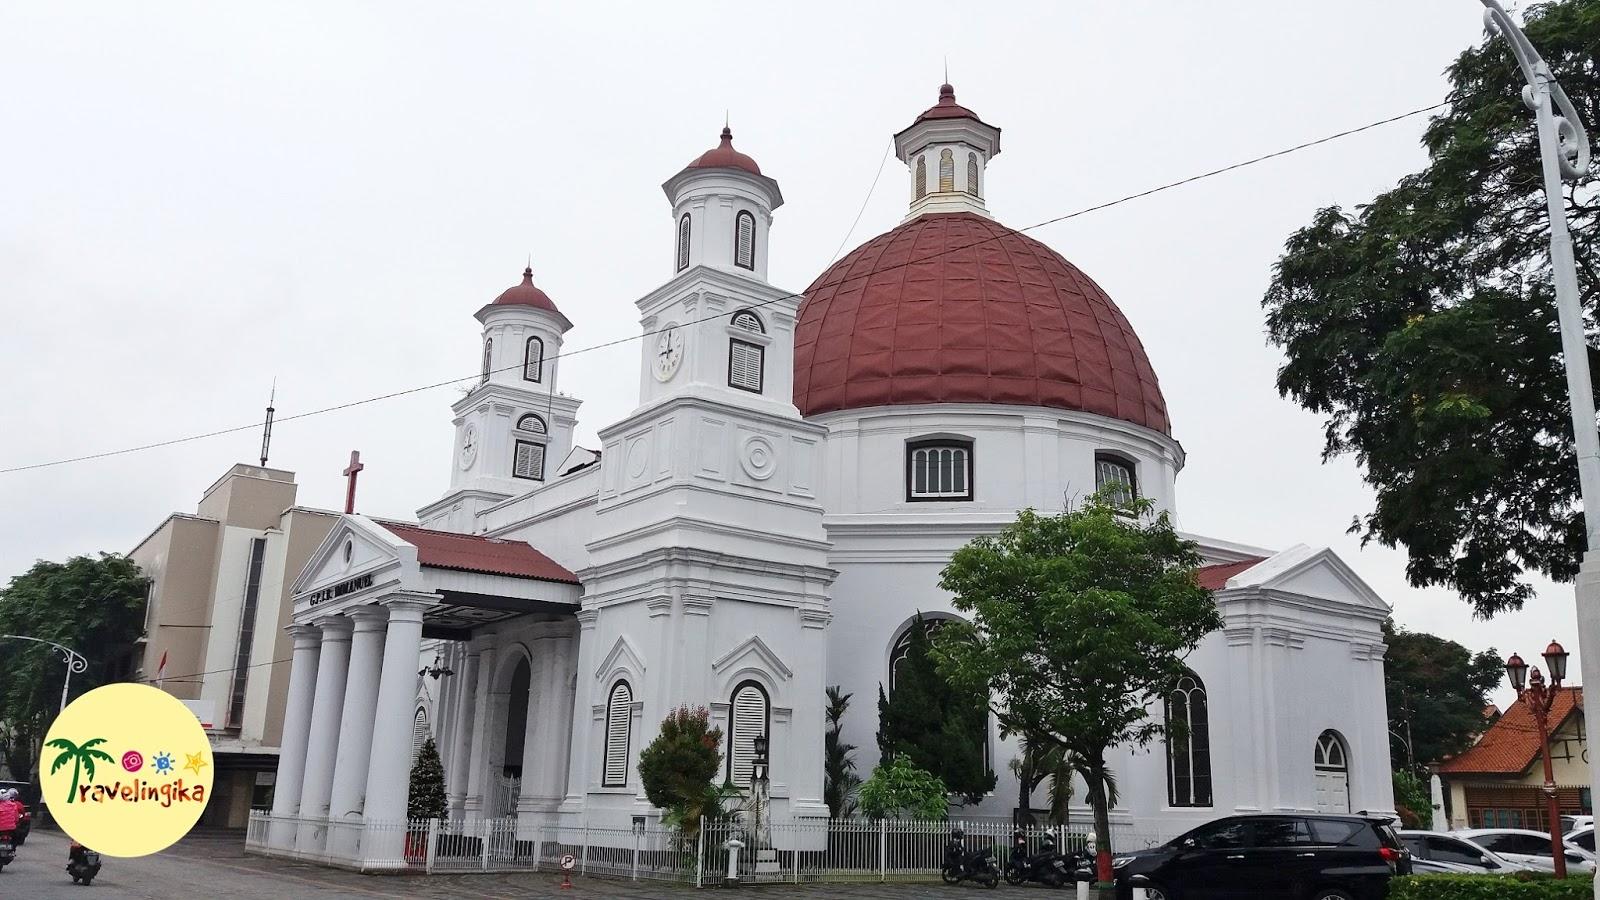 9 Spot Foto Kece Kawasan Kota Semarang Travelingika Lanjut Destinasi